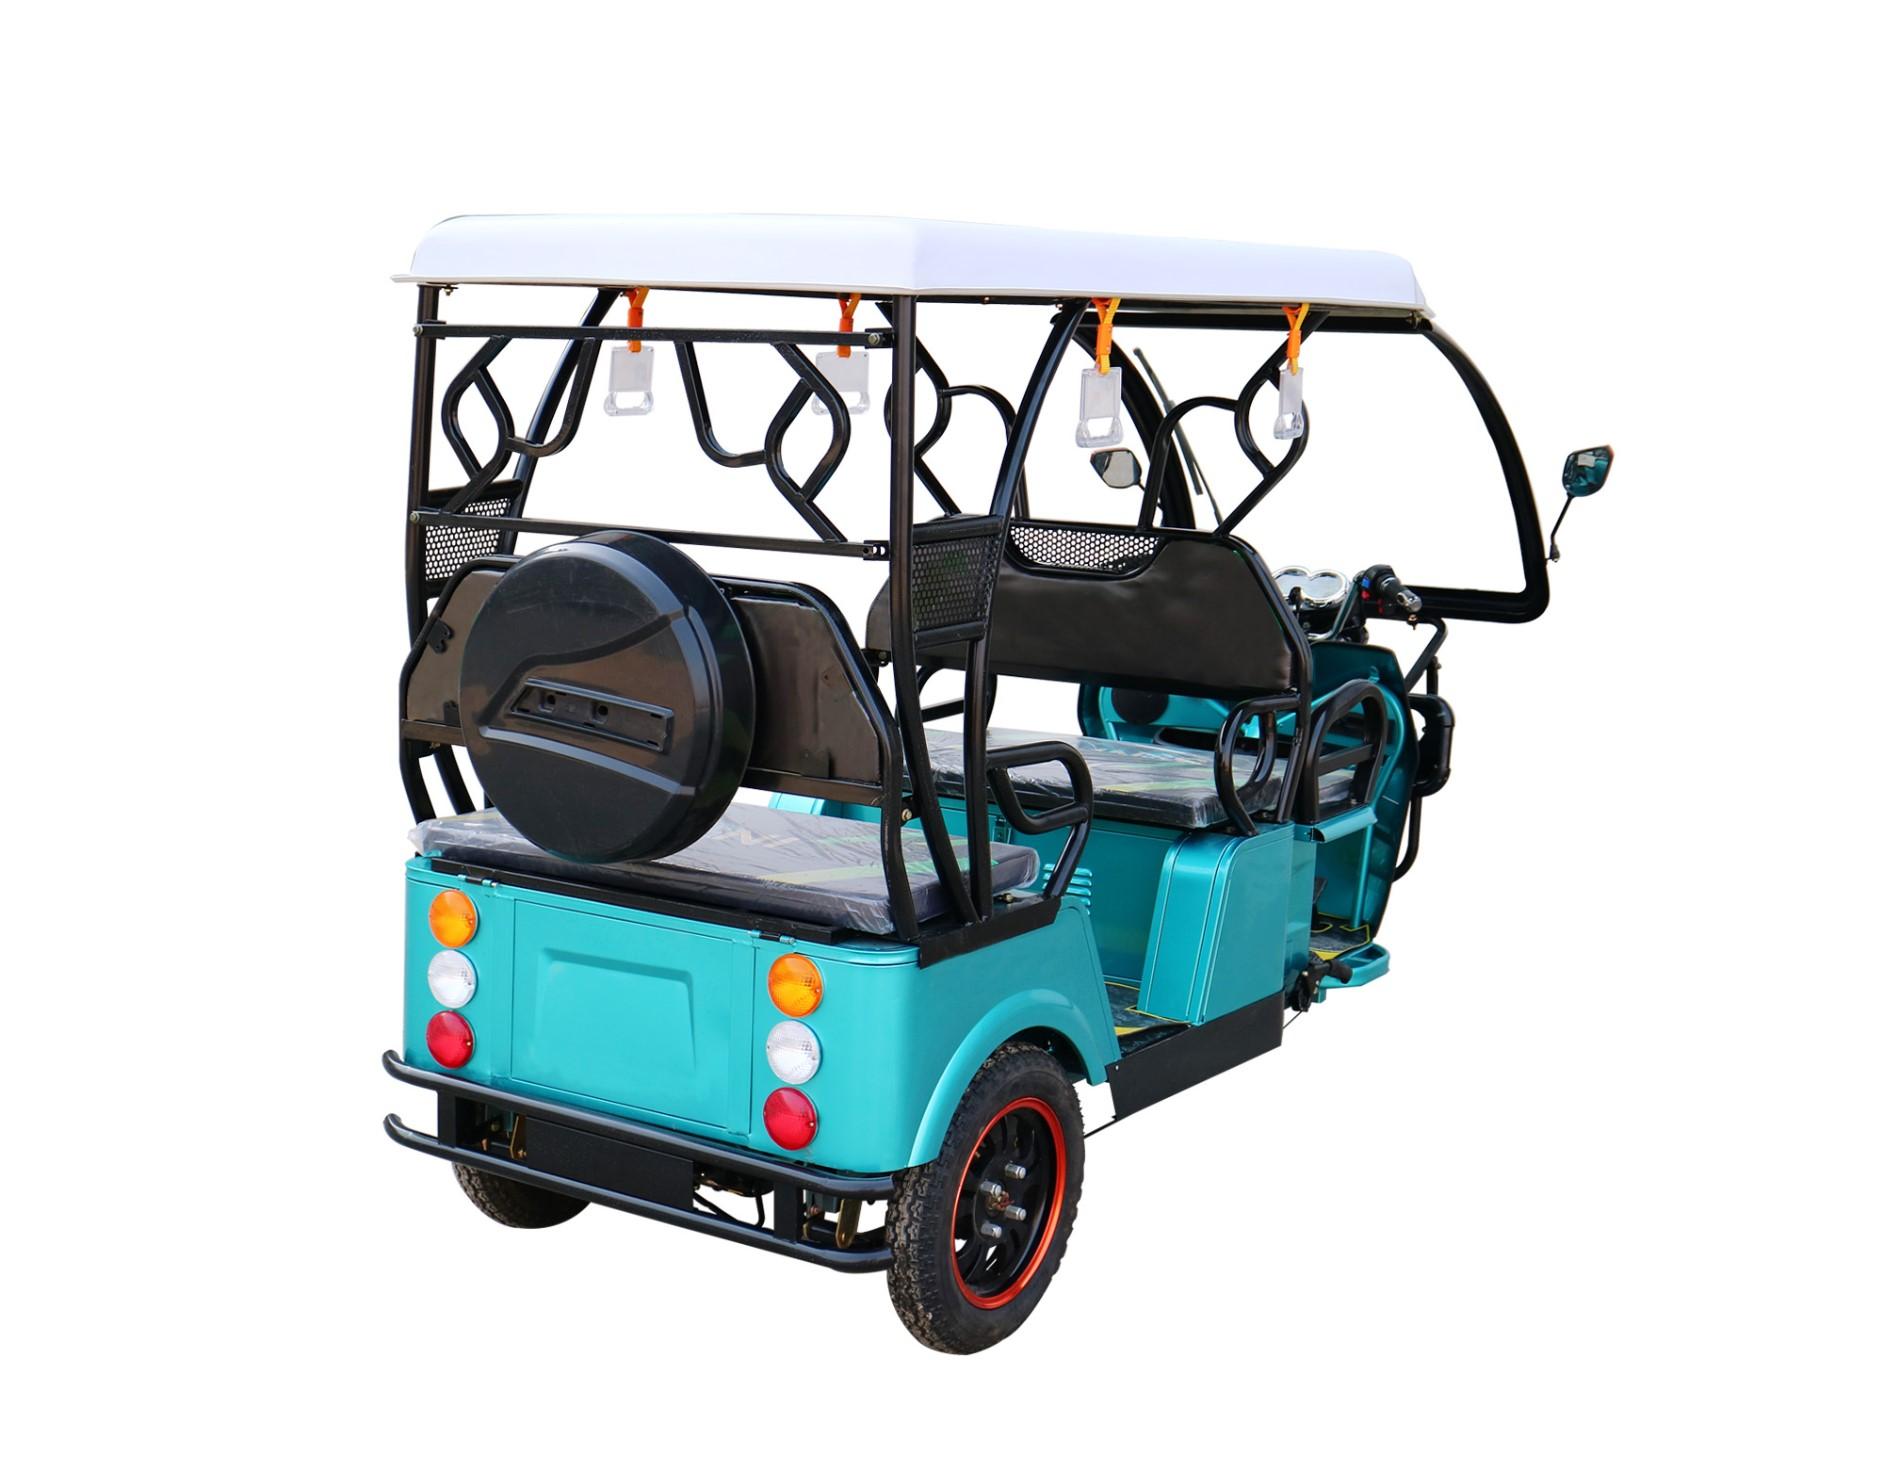 High quality Adults 5-6 passager keke bajaj electric tuk tuk rickshaw Quotes,China Adults 5-6 passager keke bajaj electric tuk tuk rickshaw Factory,Adults 5-6 passager keke bajaj electric tuk tuk rickshaw Purchasing